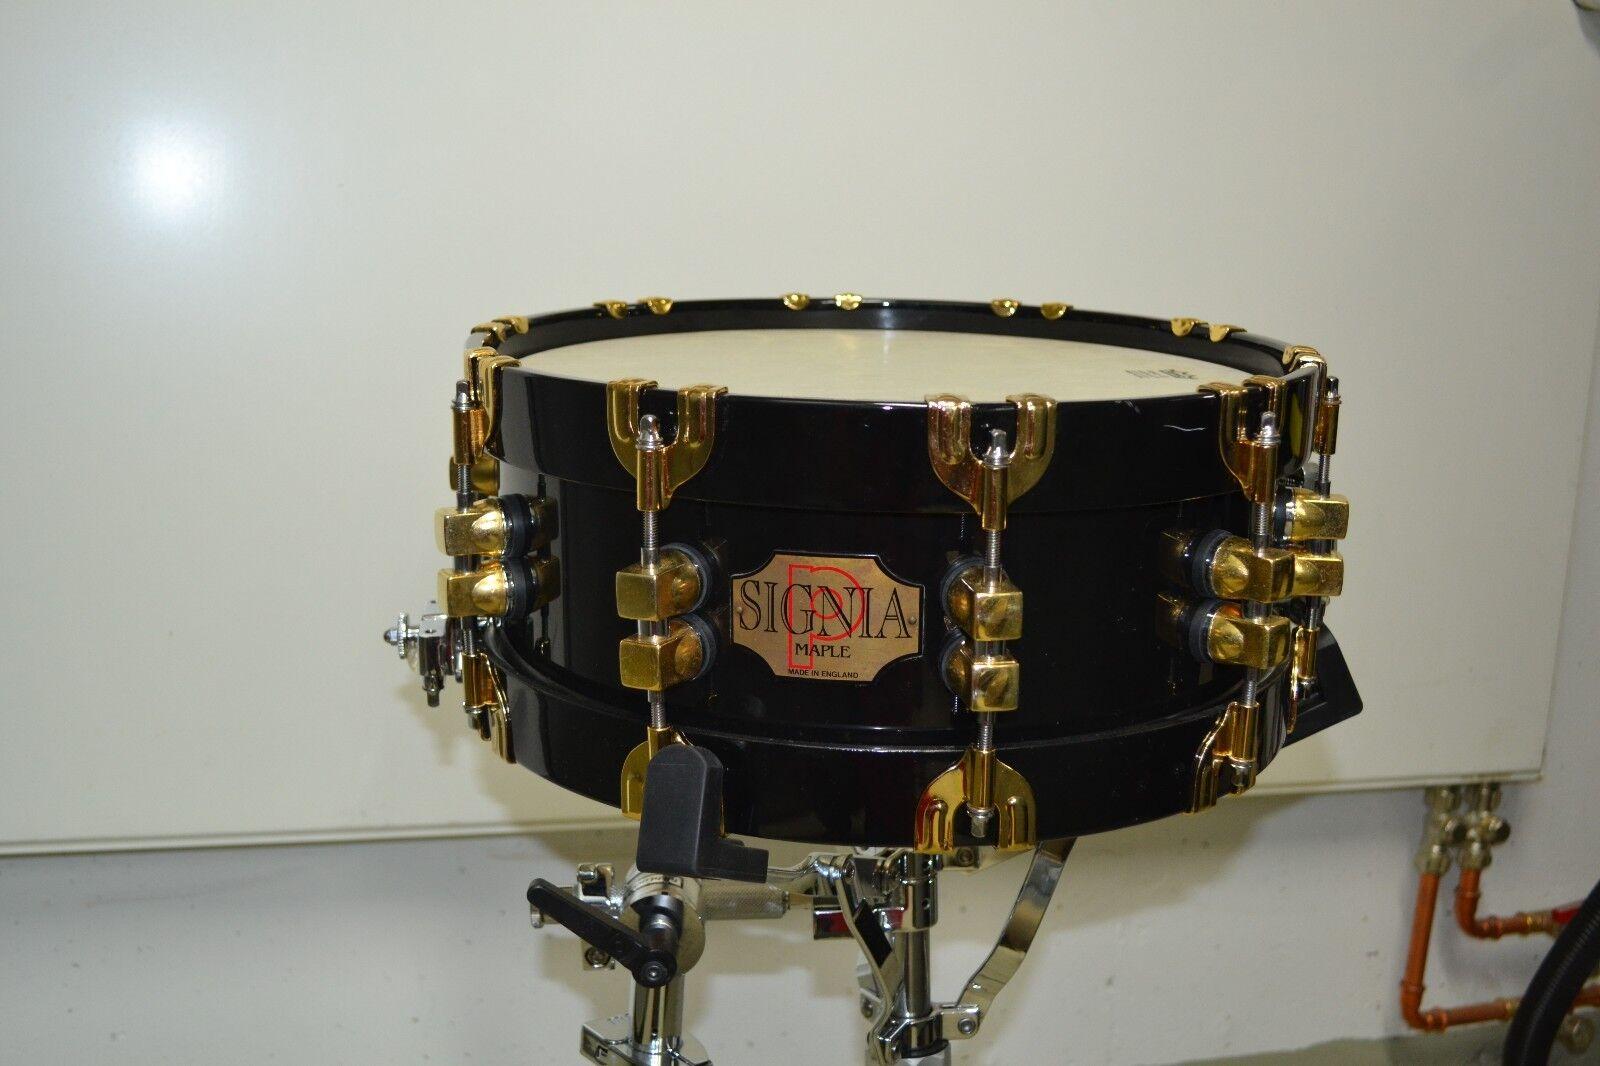 Premier Signia Maple Gold 5,5x14  schwarz Holz Snare mit Koffer